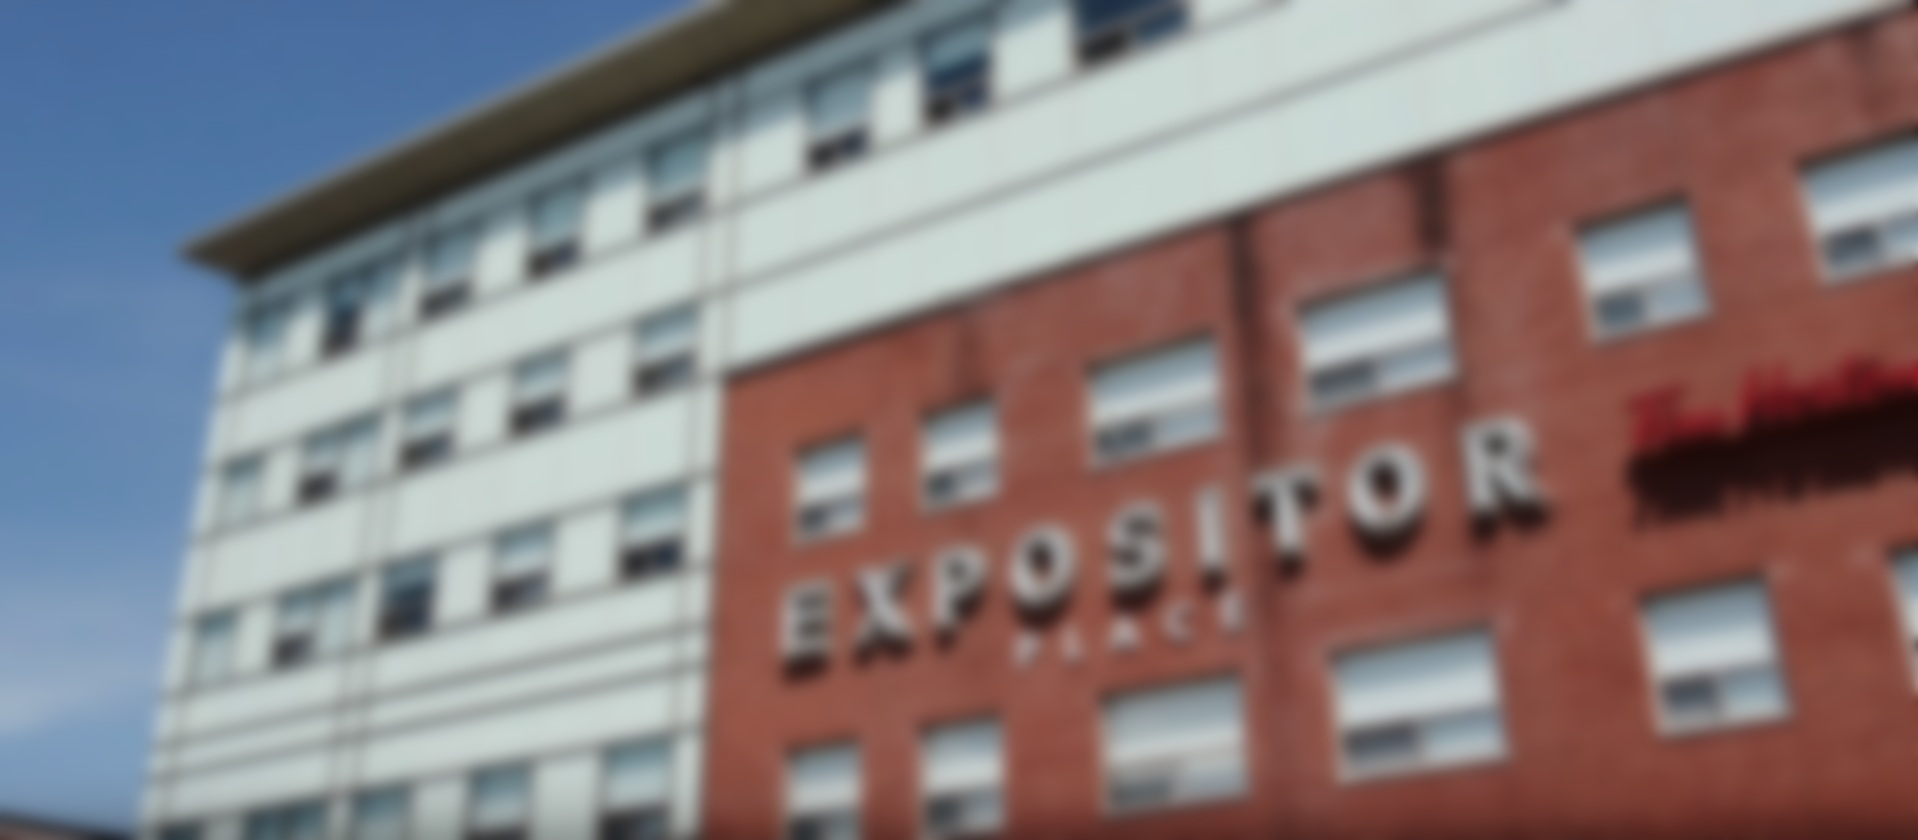 Brantford Newsroom -